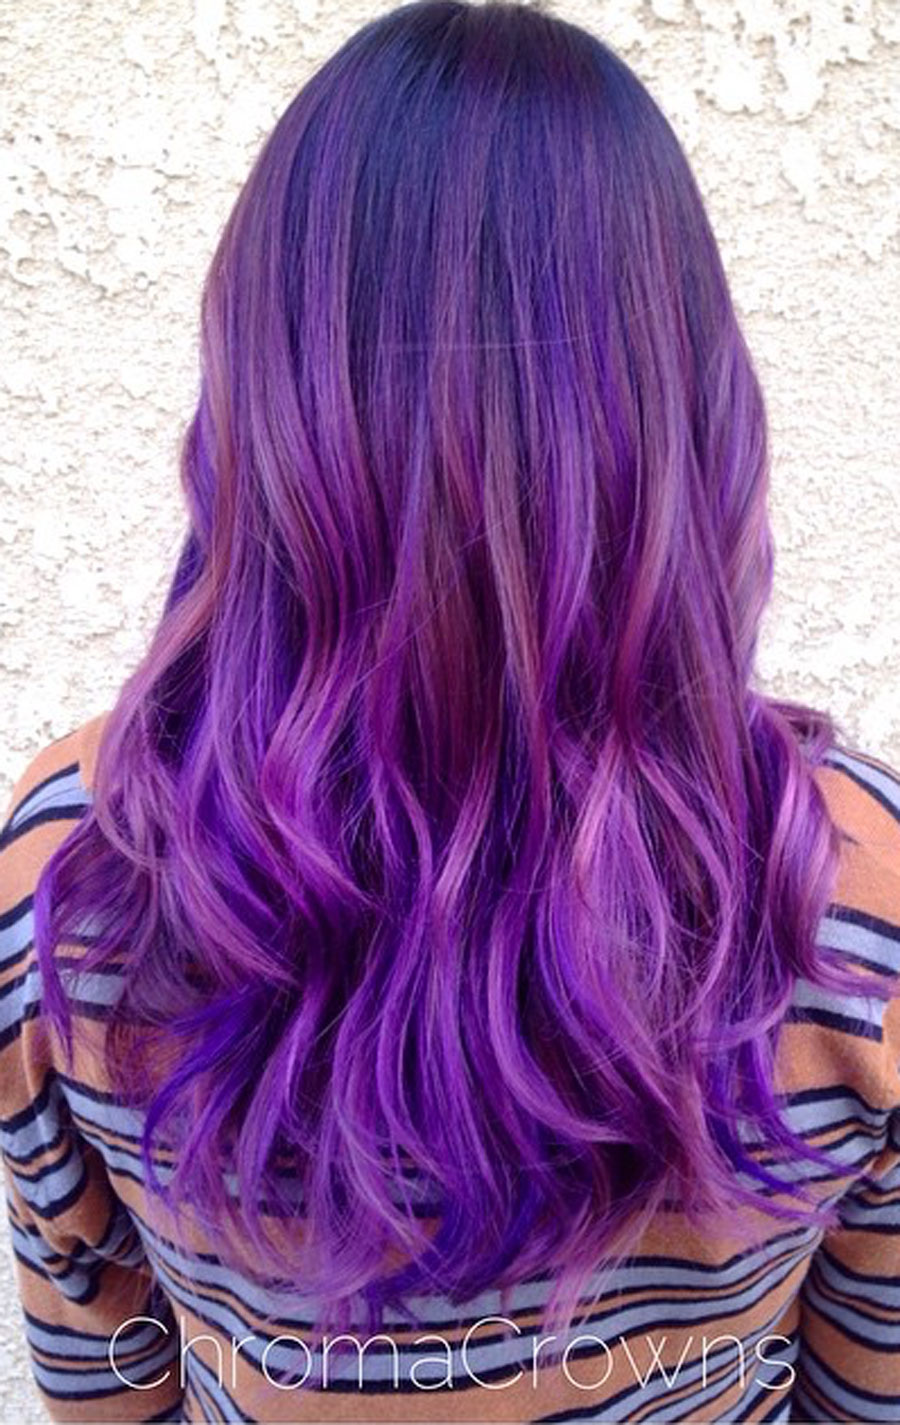 How-To: Mermaid-Inspired Purple